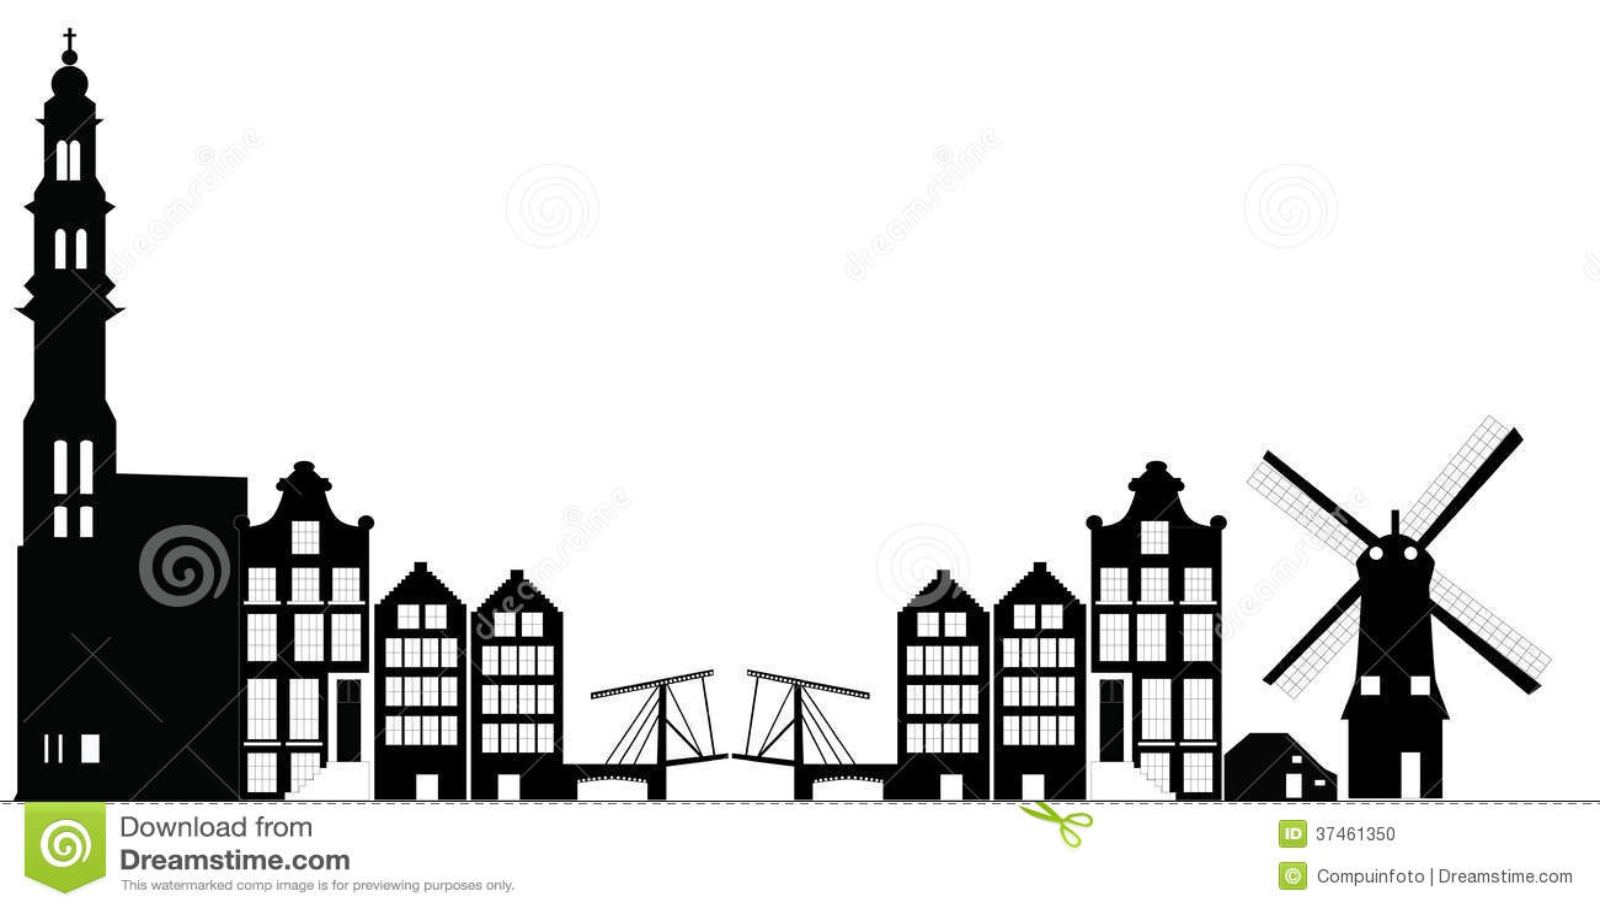 Amsterdam main city netherlands skyline with church tower and bridge.